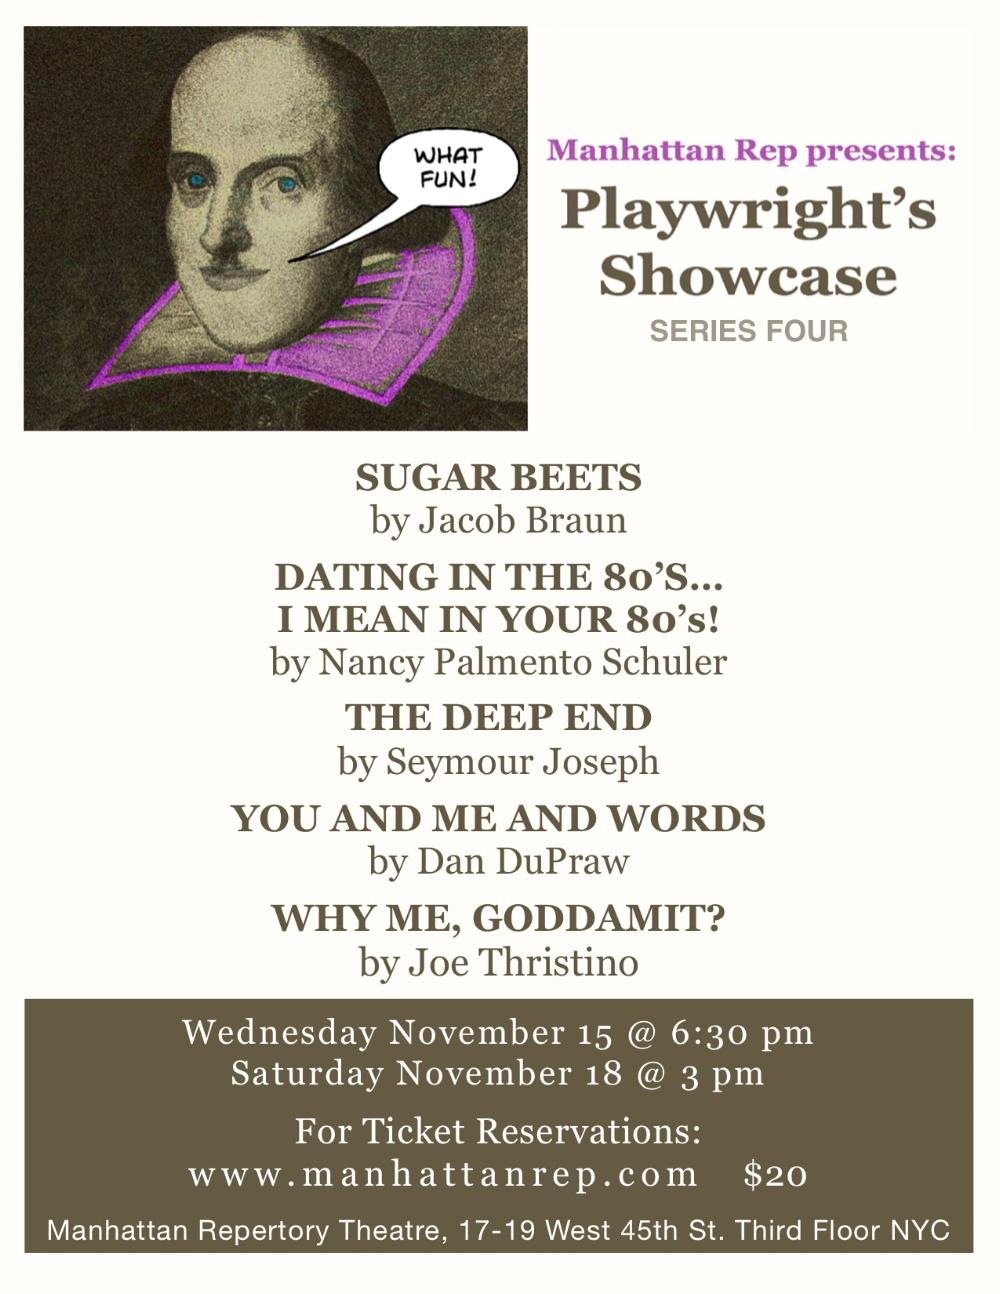 Playwrights Showcase 4 NEW.jpeg